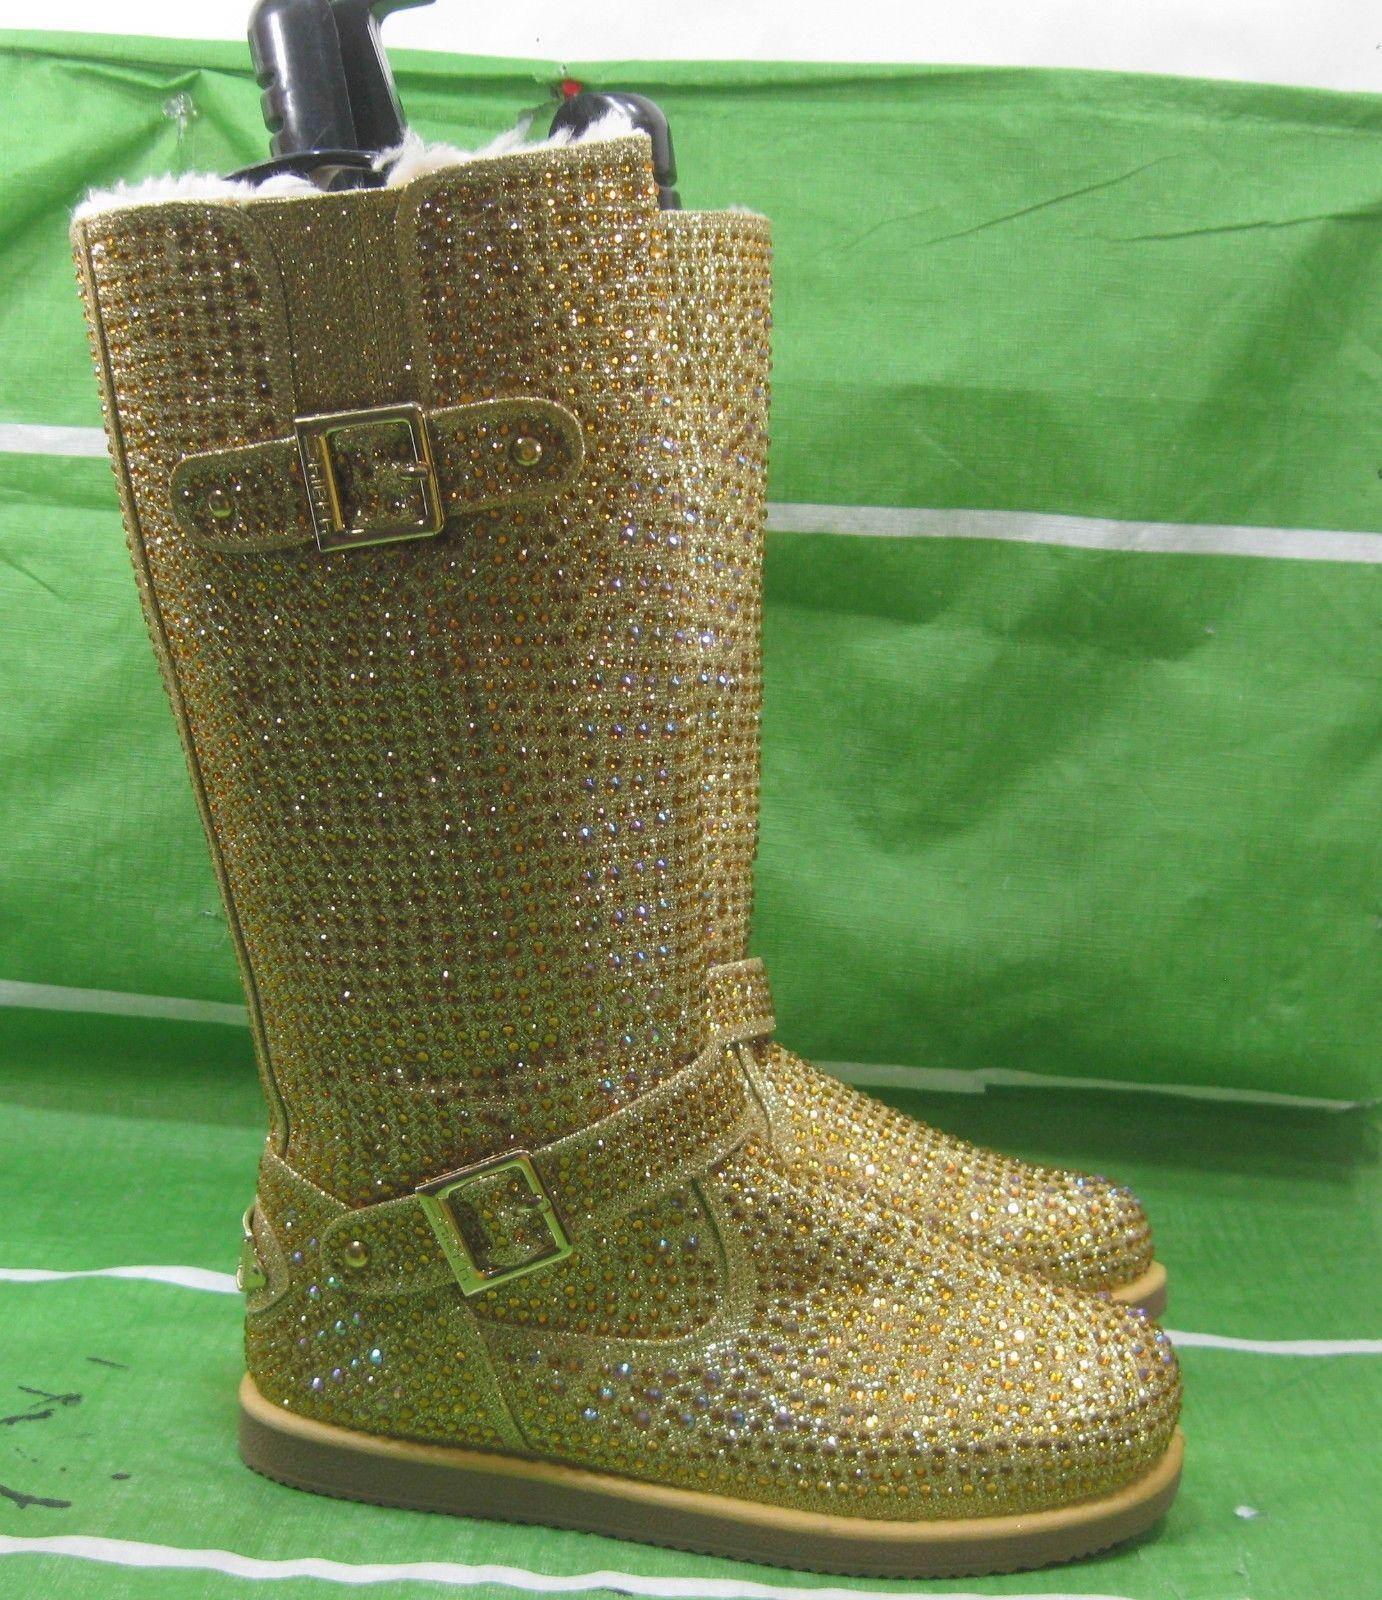 New ladies Urban Glitter High gold Rhinestones Winter Mid-Calf Sexy Boot Size 7